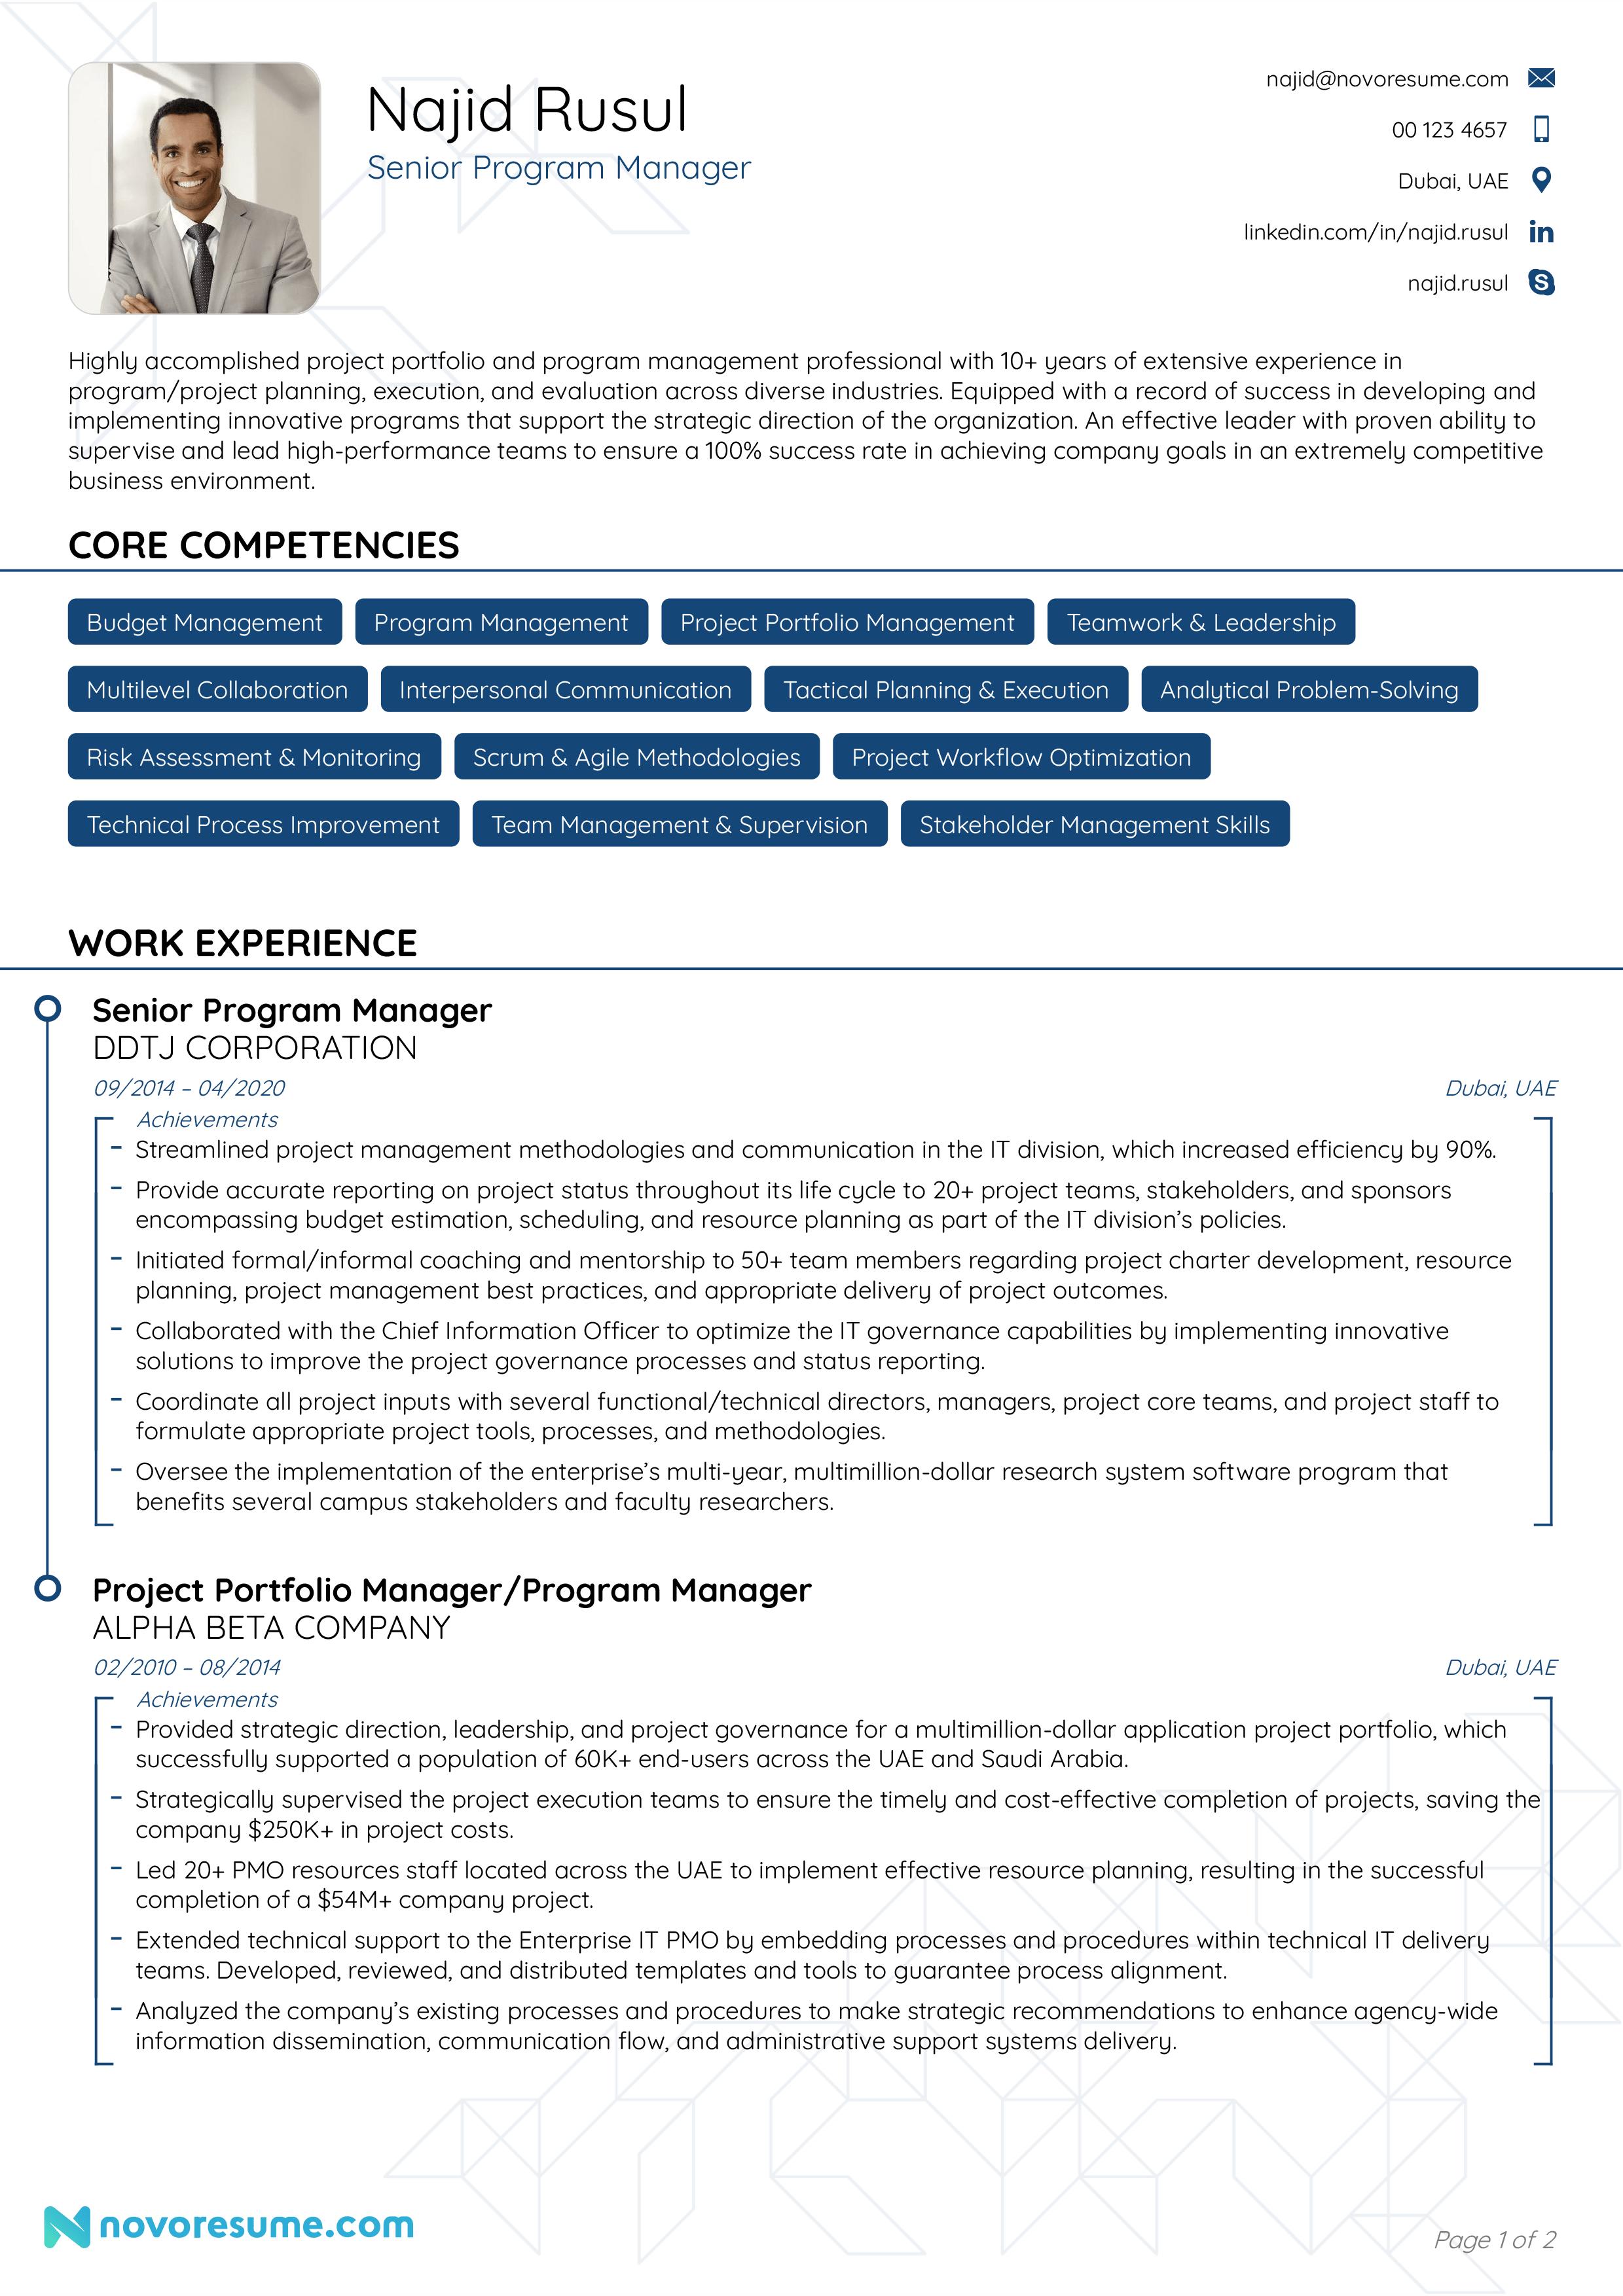 Program management resume template essay about christopher columbus as a villain